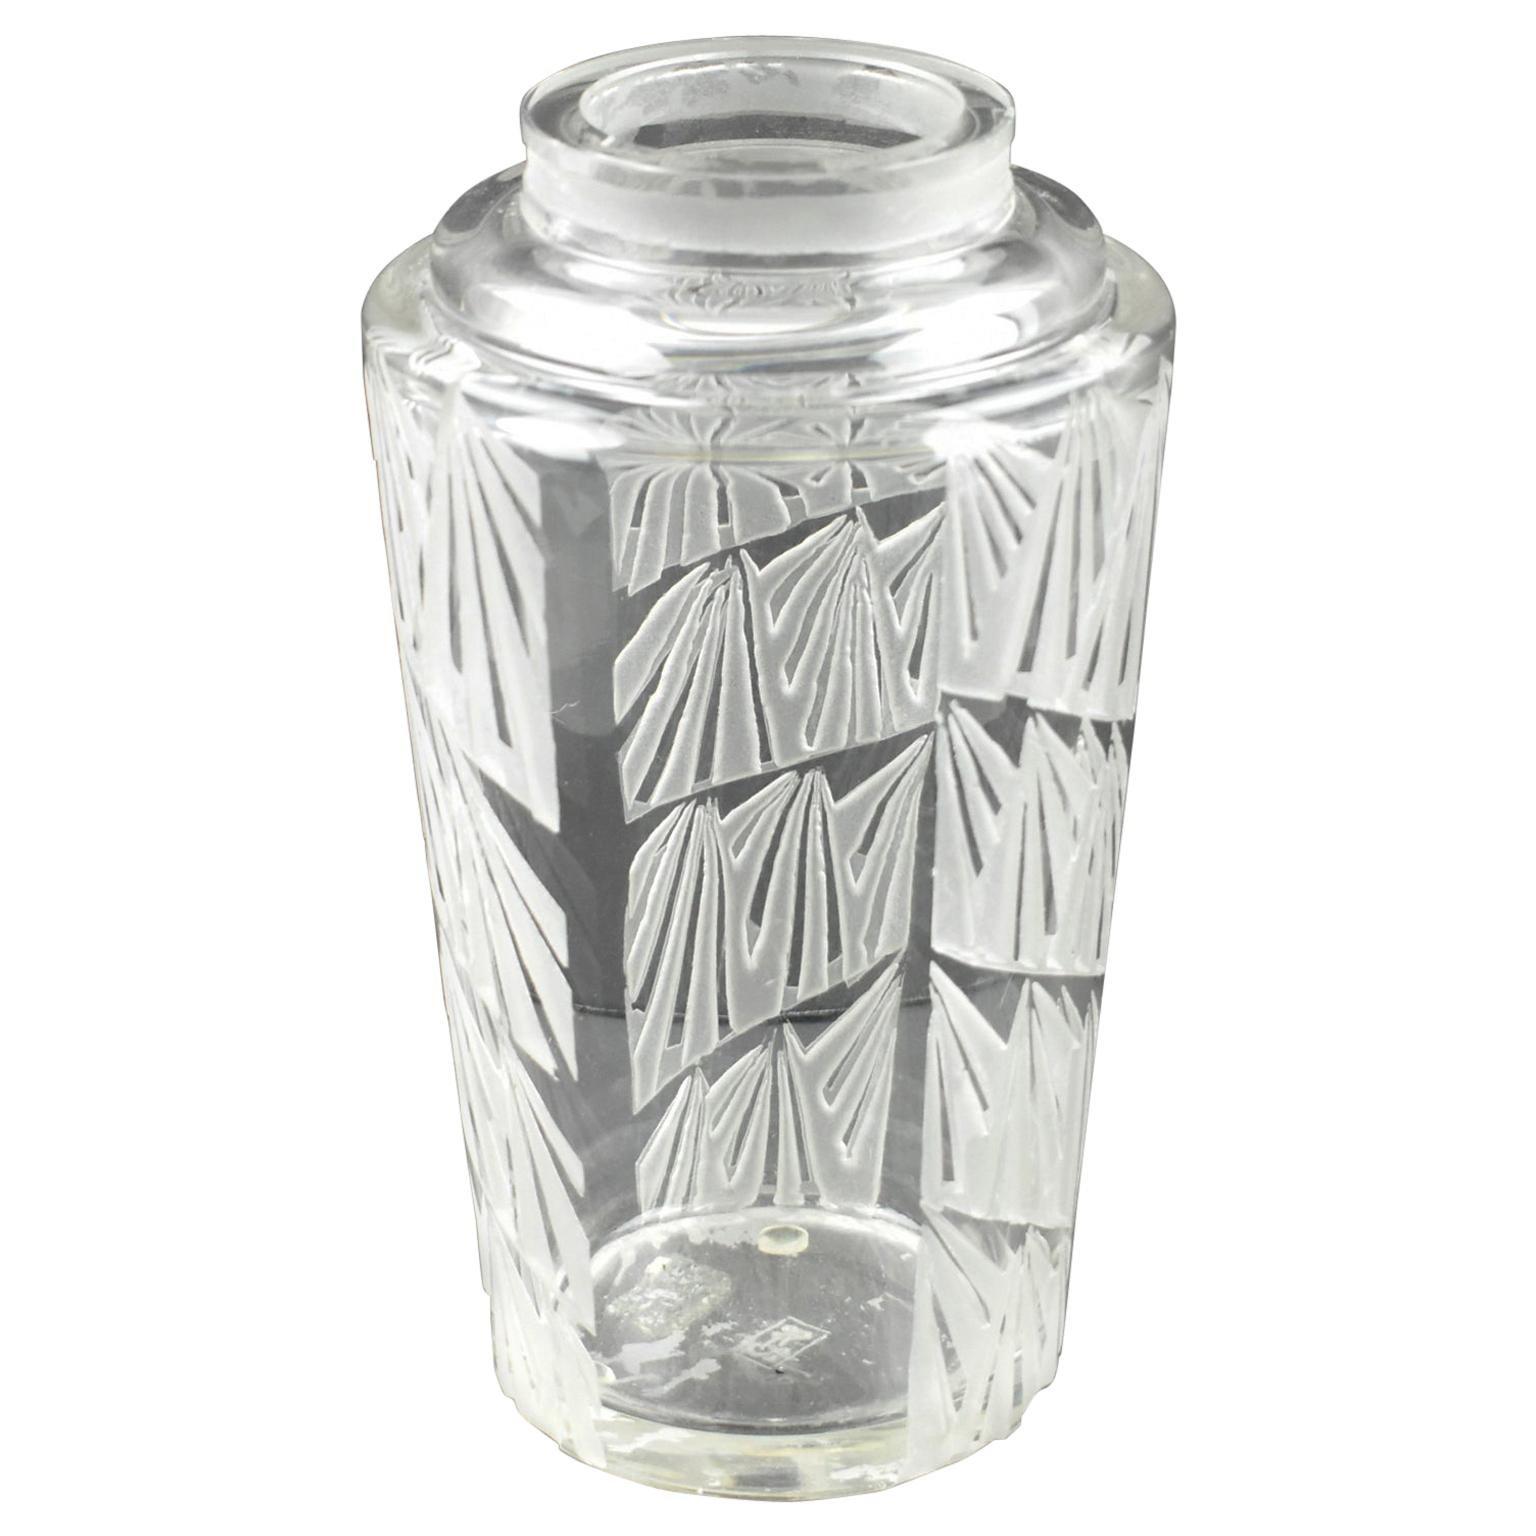 Jean Luce 1930s Art Deco Geometric Etched Glass Vase